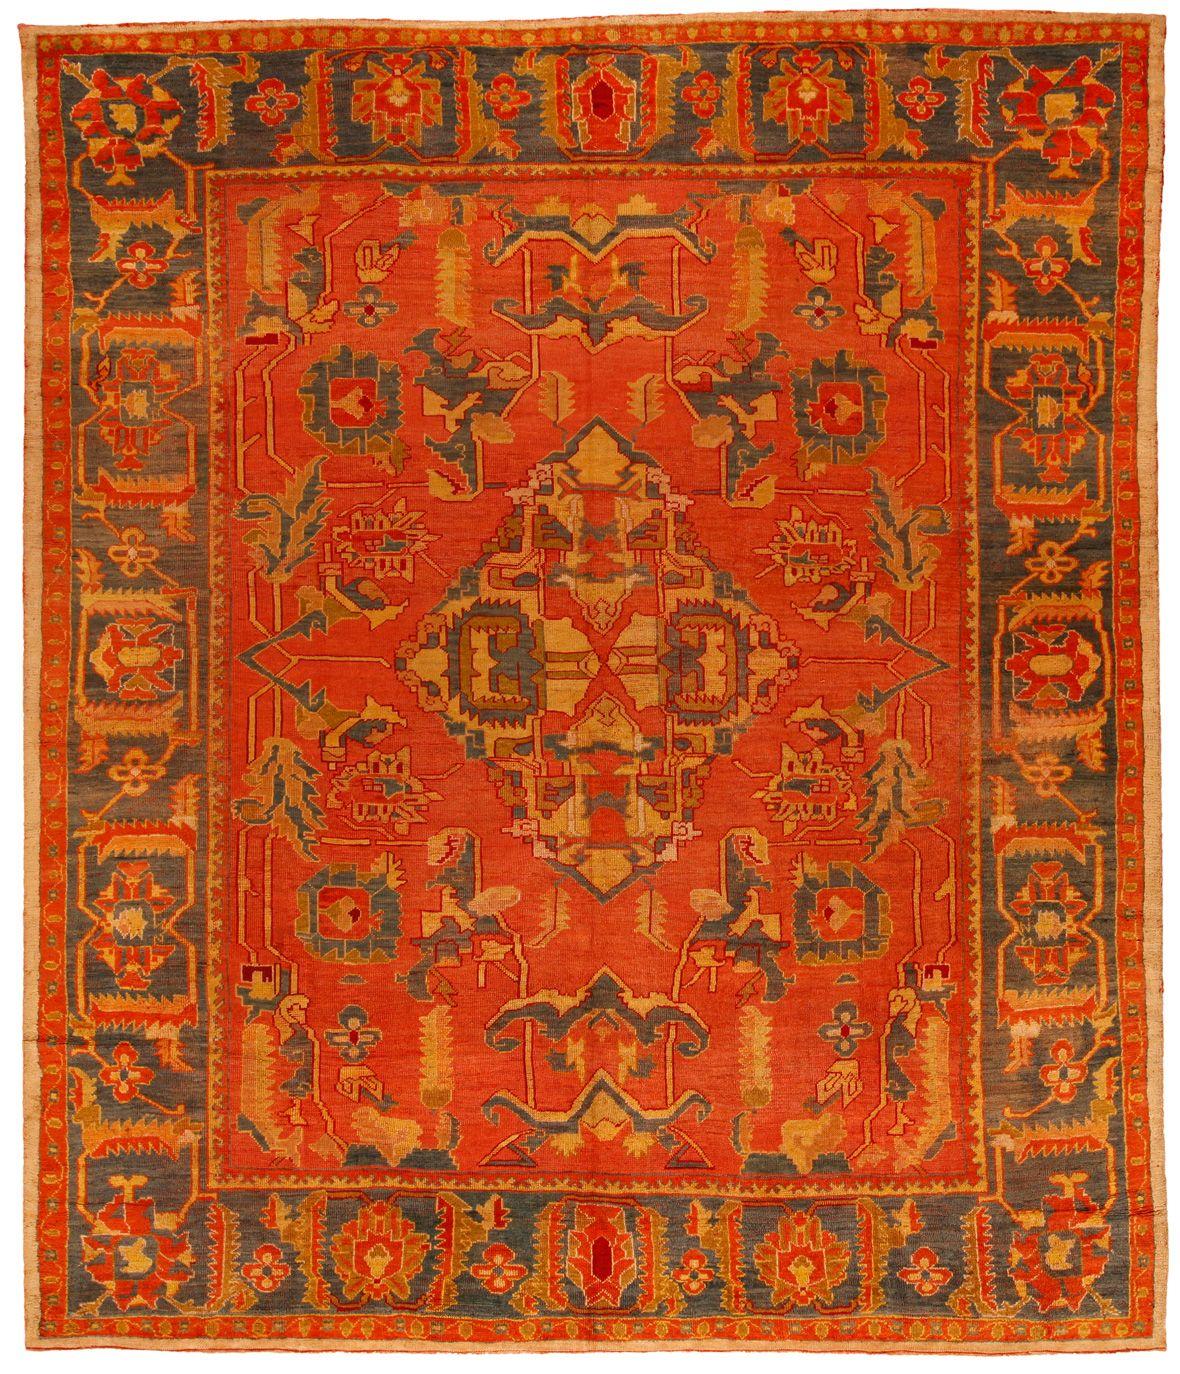 Antique Oushak Carpet 9.9 X 11.6 - Fred Moheban Gallery